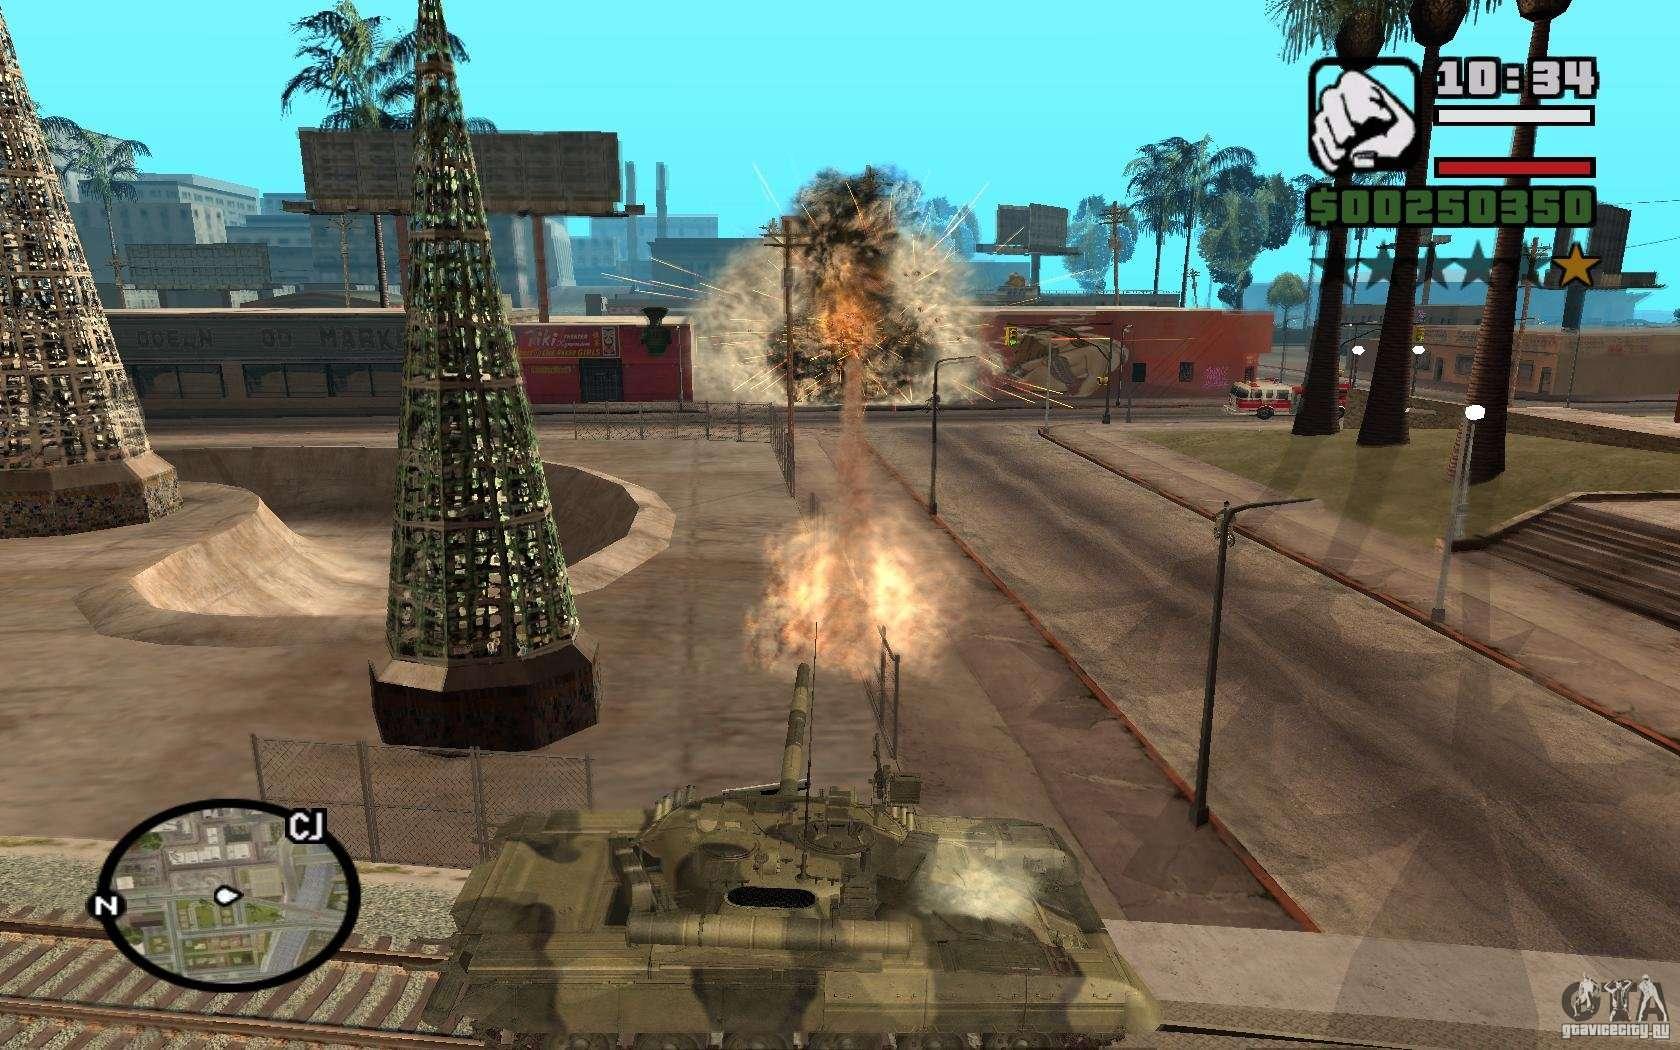 Hydra Panzer Mod For Gta San Andreas